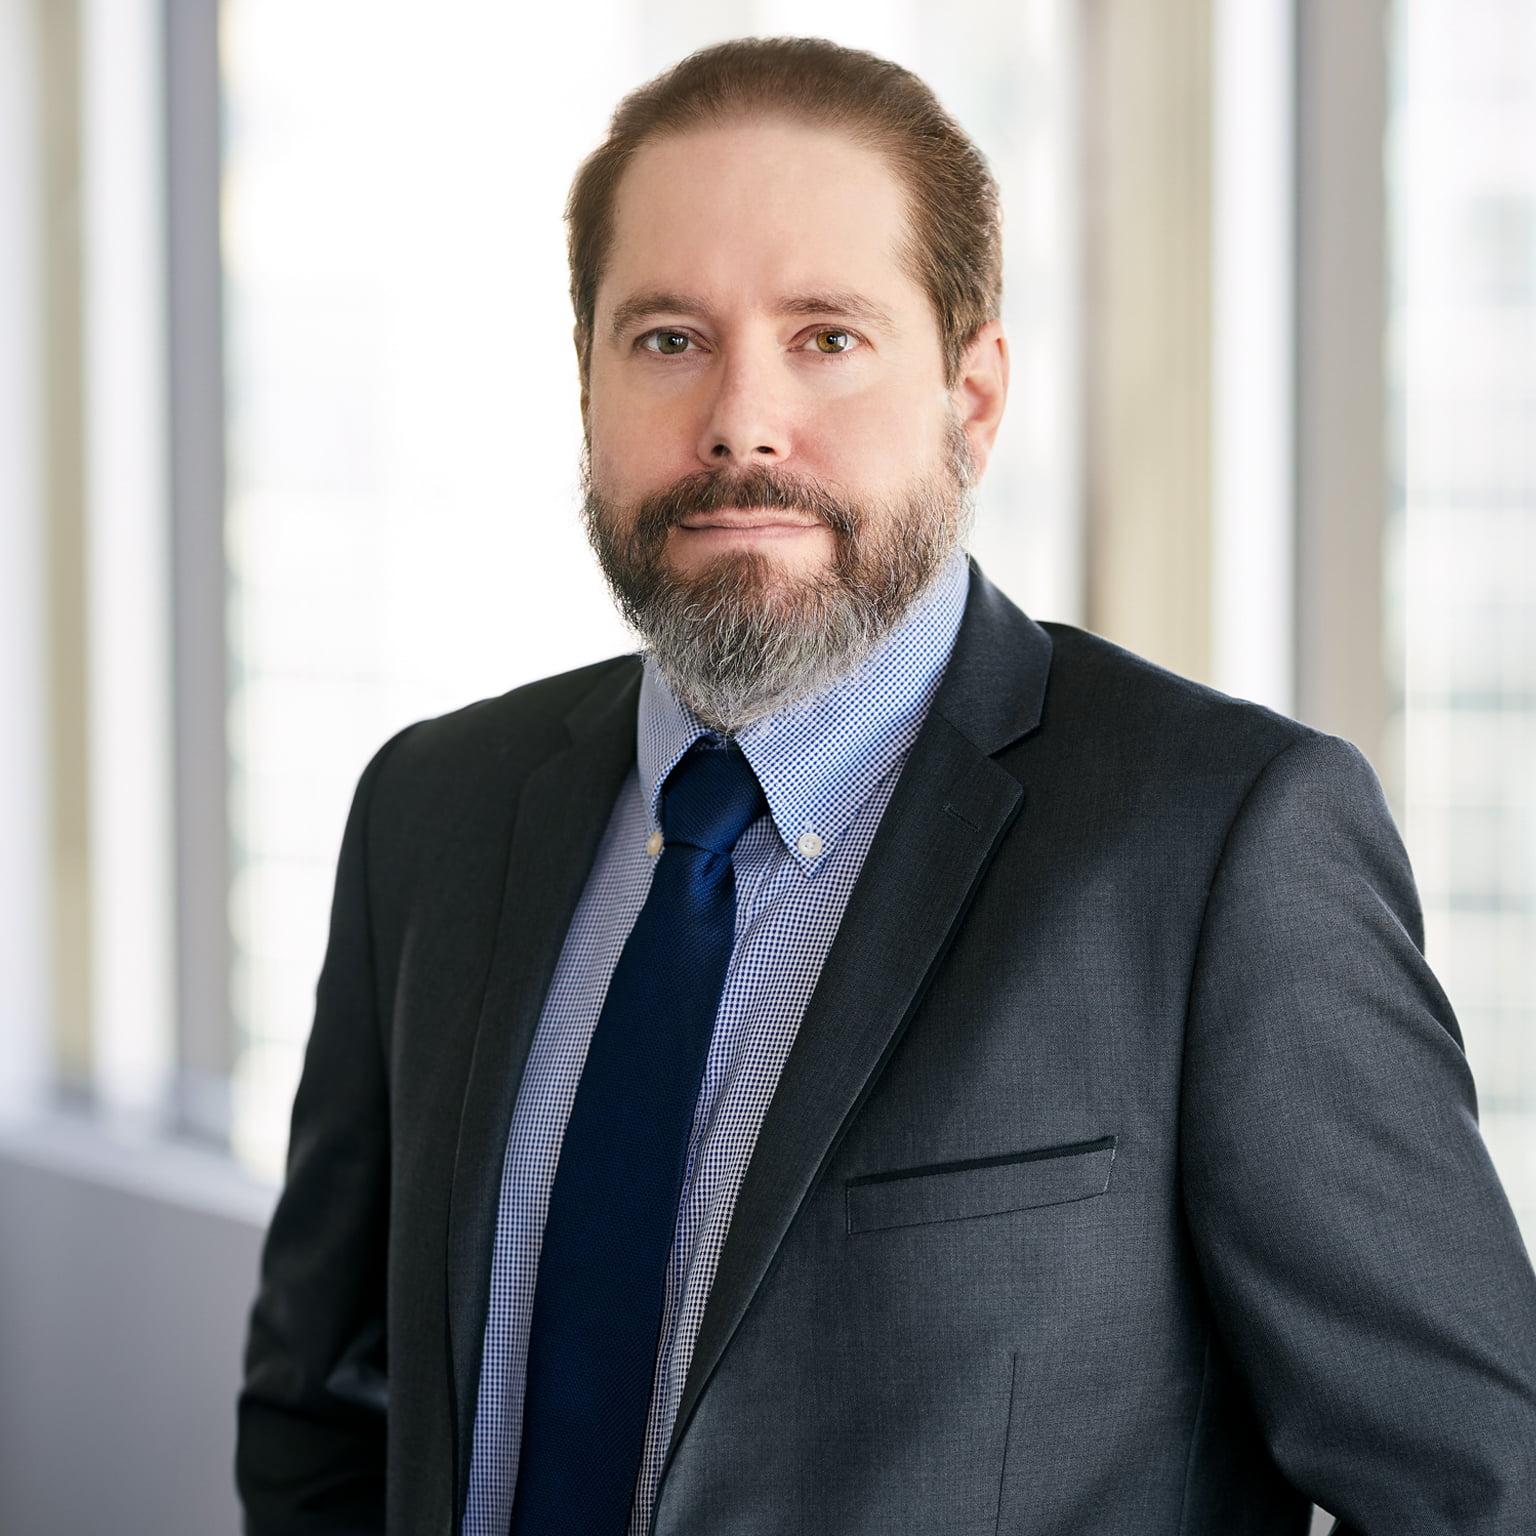 Michael Selchen